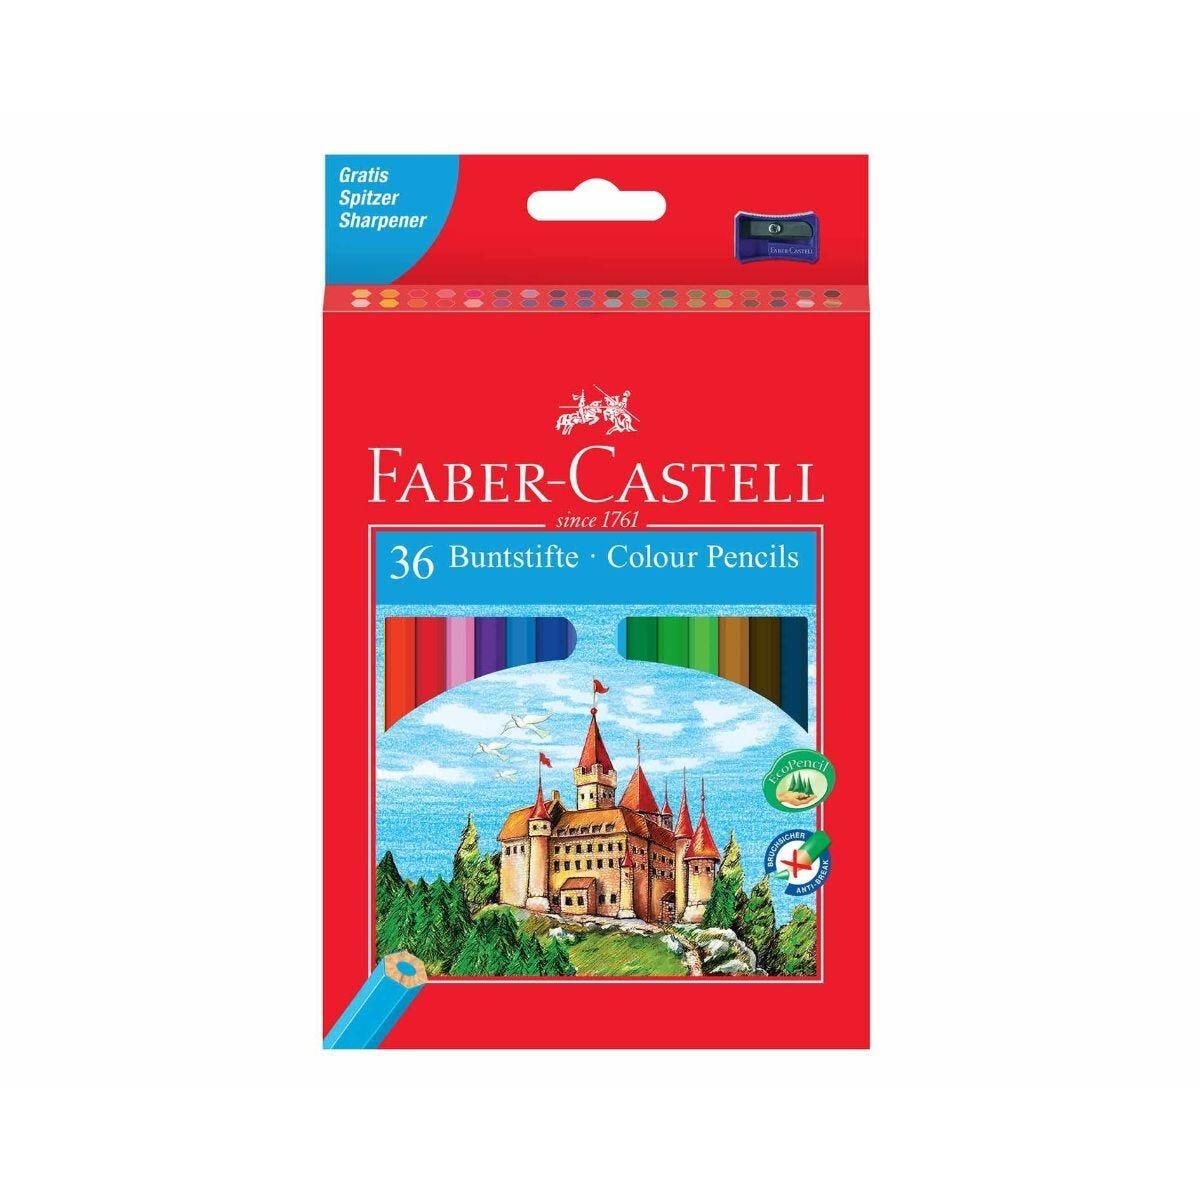 Faber Castell Eco Pencils Colour Pack 36